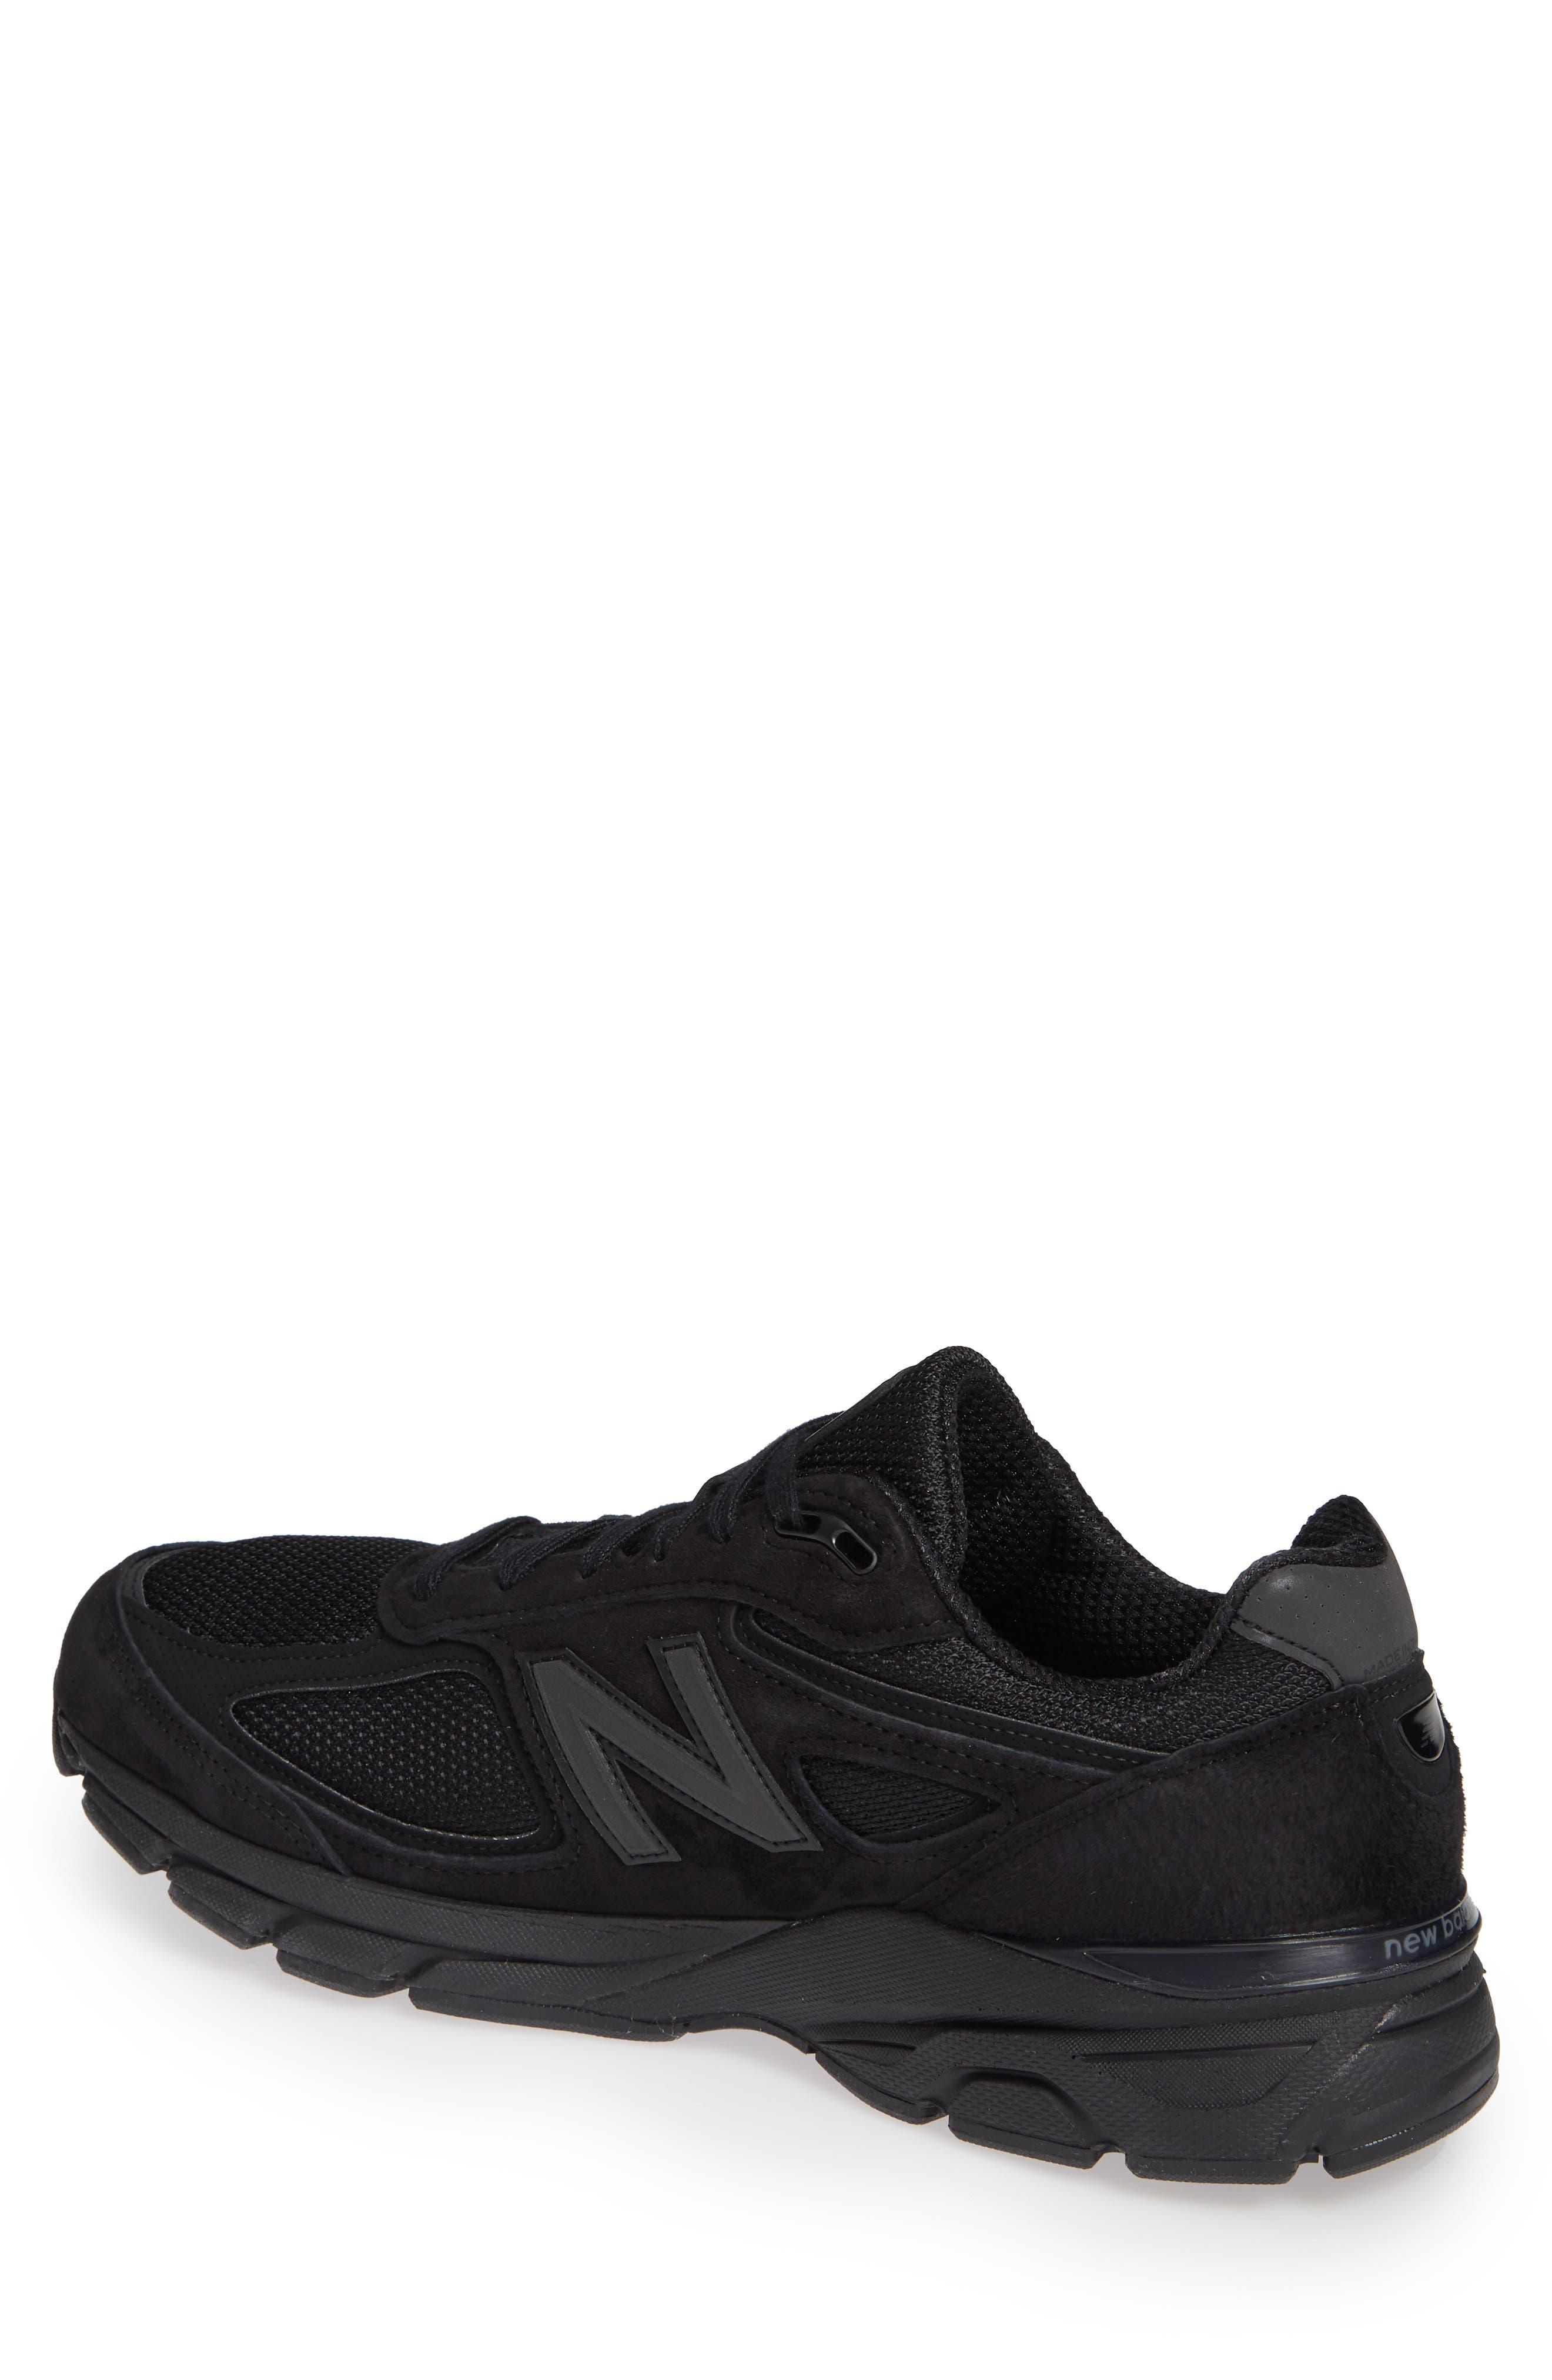 '990' Running Shoe,                             Alternate thumbnail 2, color,                             BLACK/BLACk